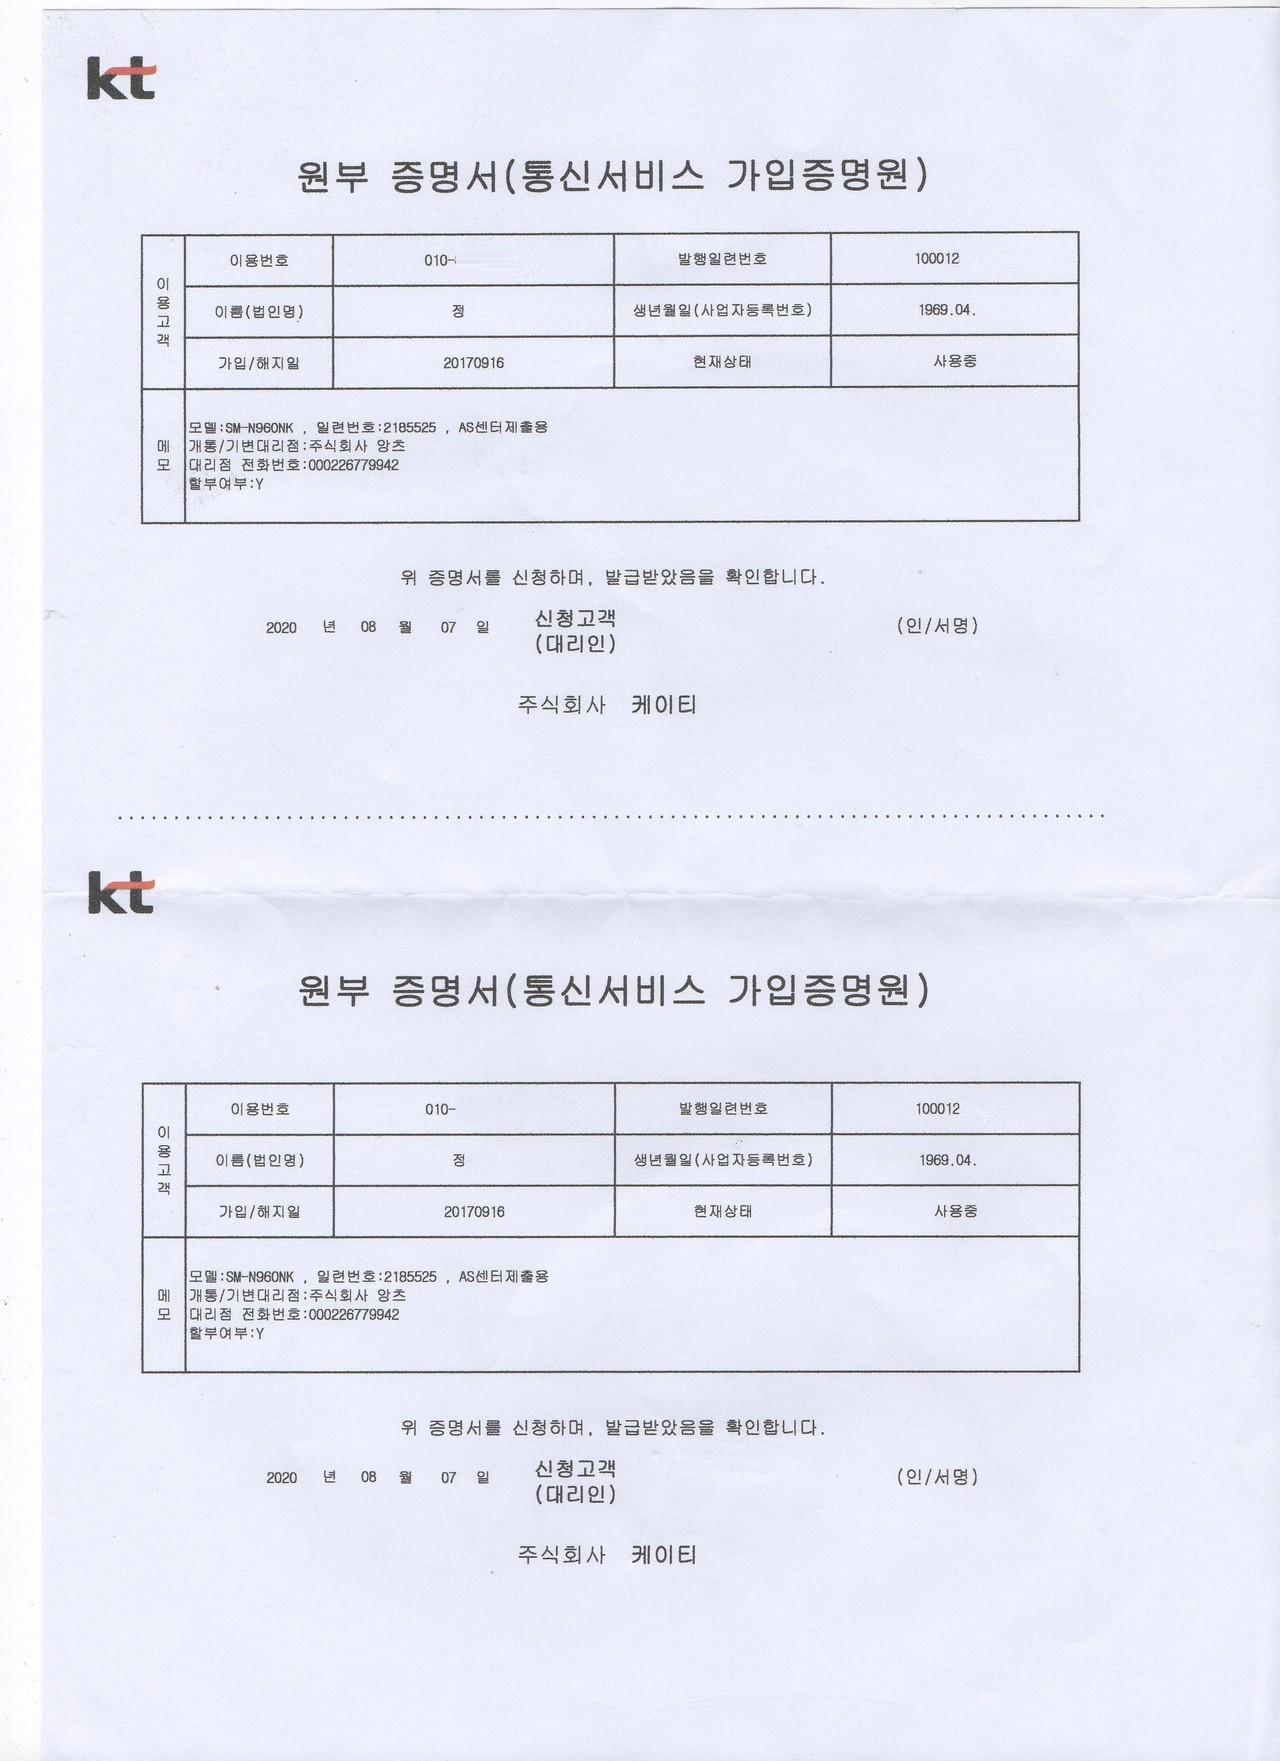 KT 통신사 - 원부 증명서 (통신서비스 가입증명원)